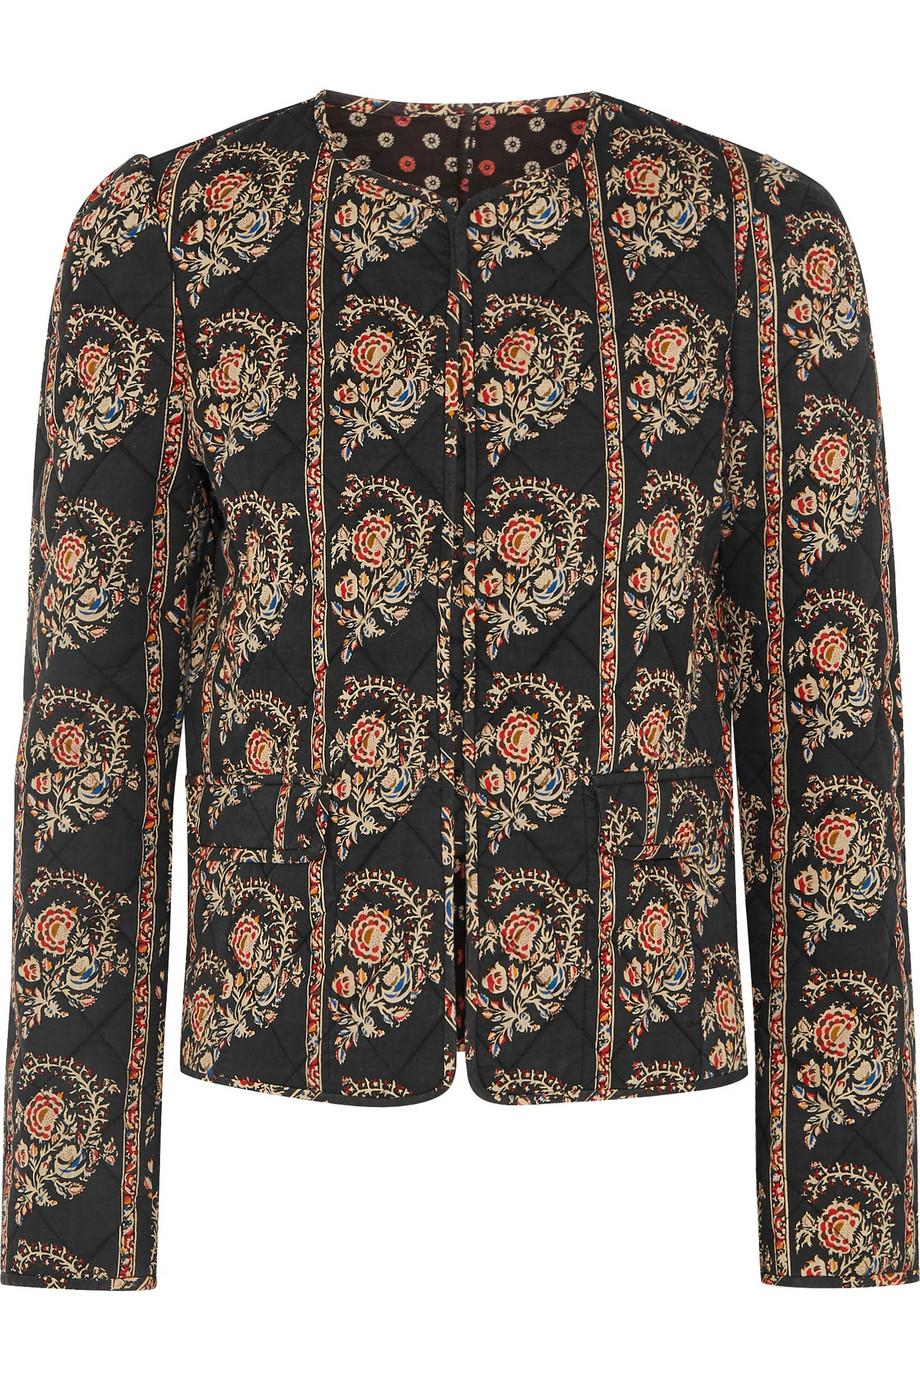 Isabel Marant Étoile Elmer reversible quilted jacket £220